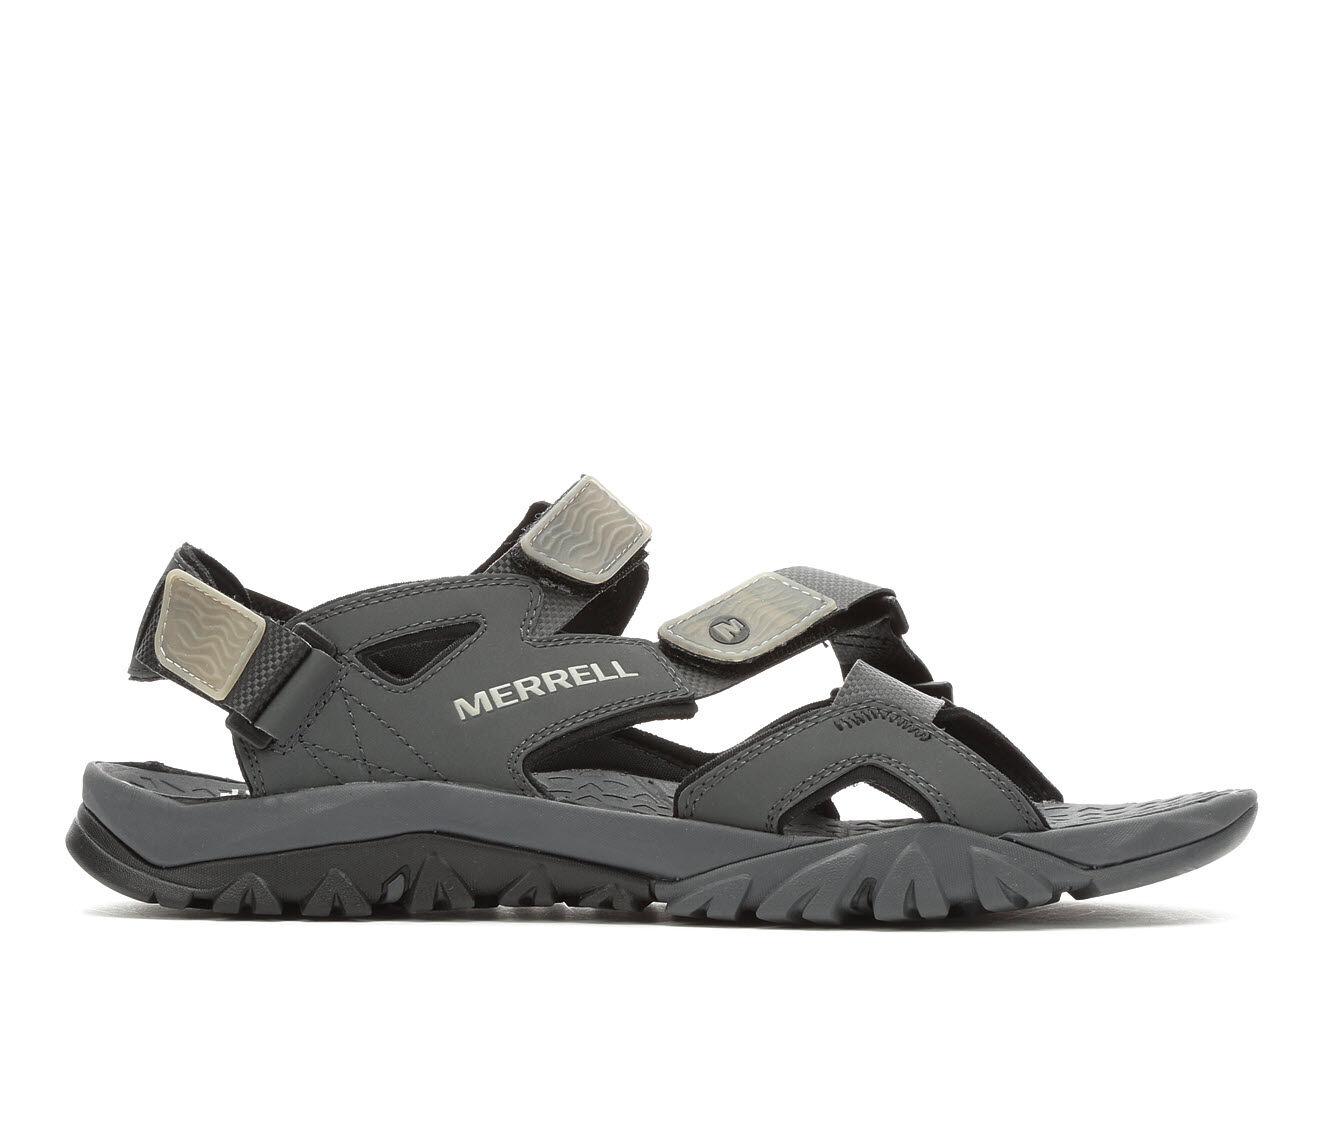 Men's Merrell Tetrex Crest Strap Hiking Sandals Black